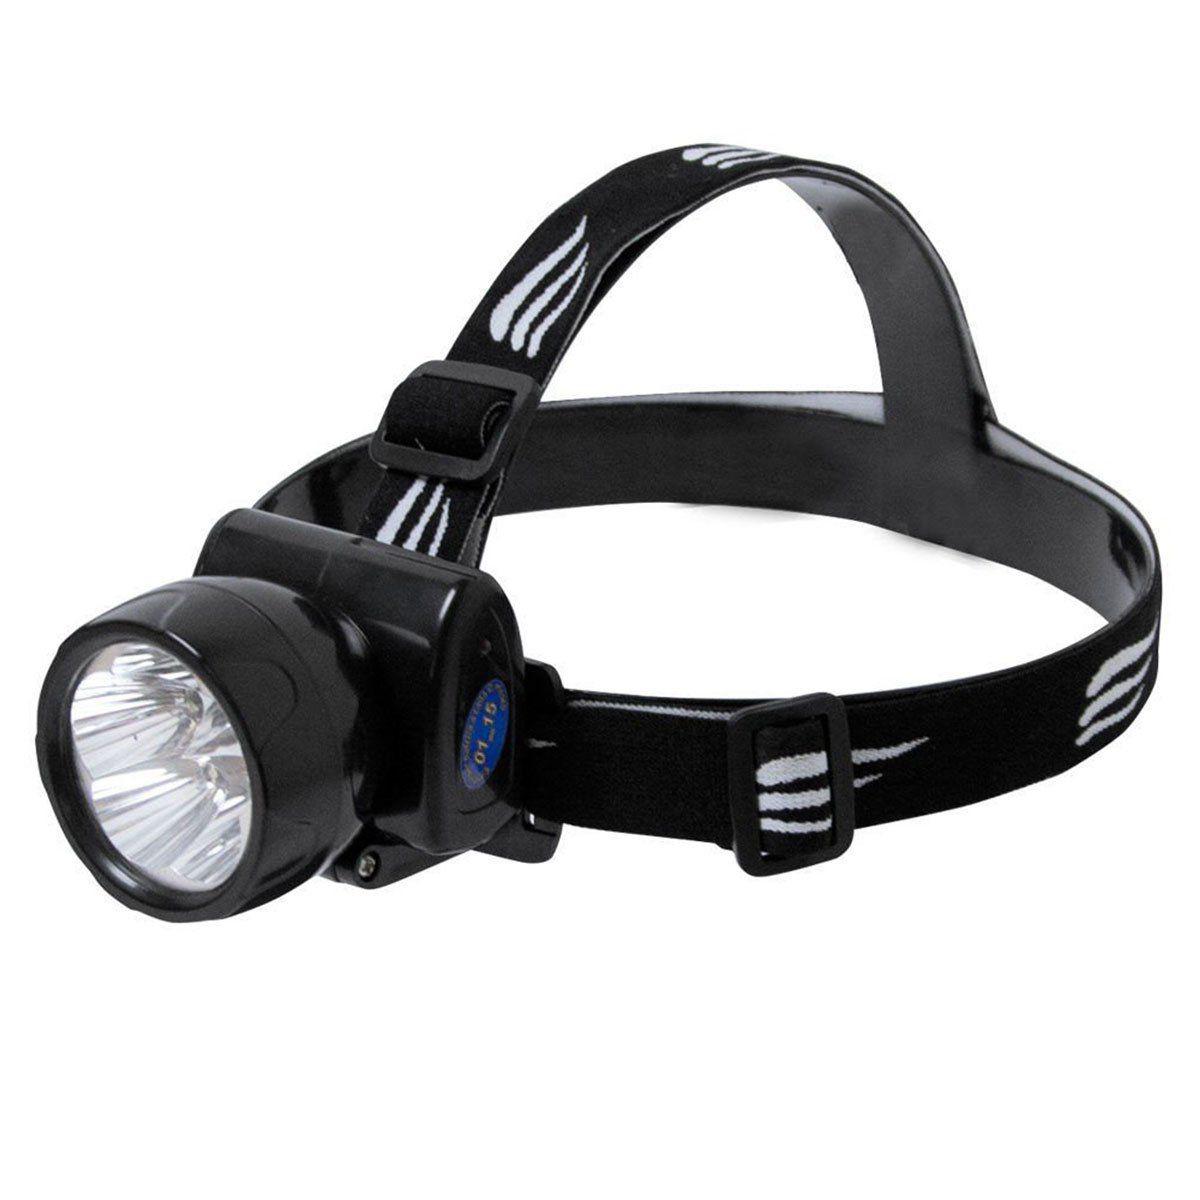 Lanterna de Cabeça Nautika Fenix Recarregável 13 Lumens